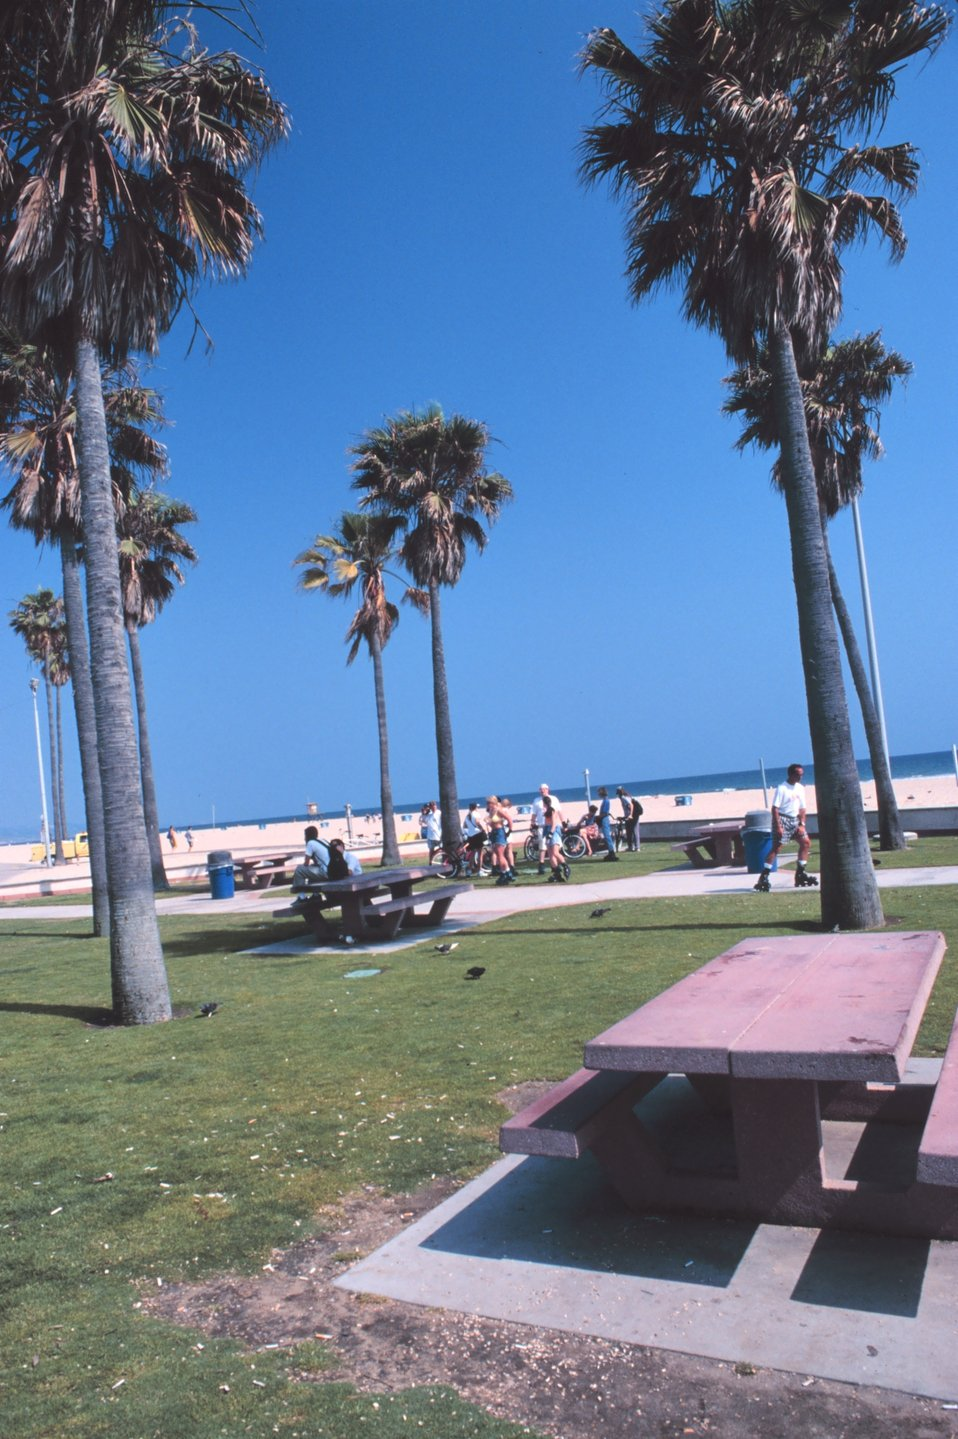 Southern California dreaming - the beach at Newport